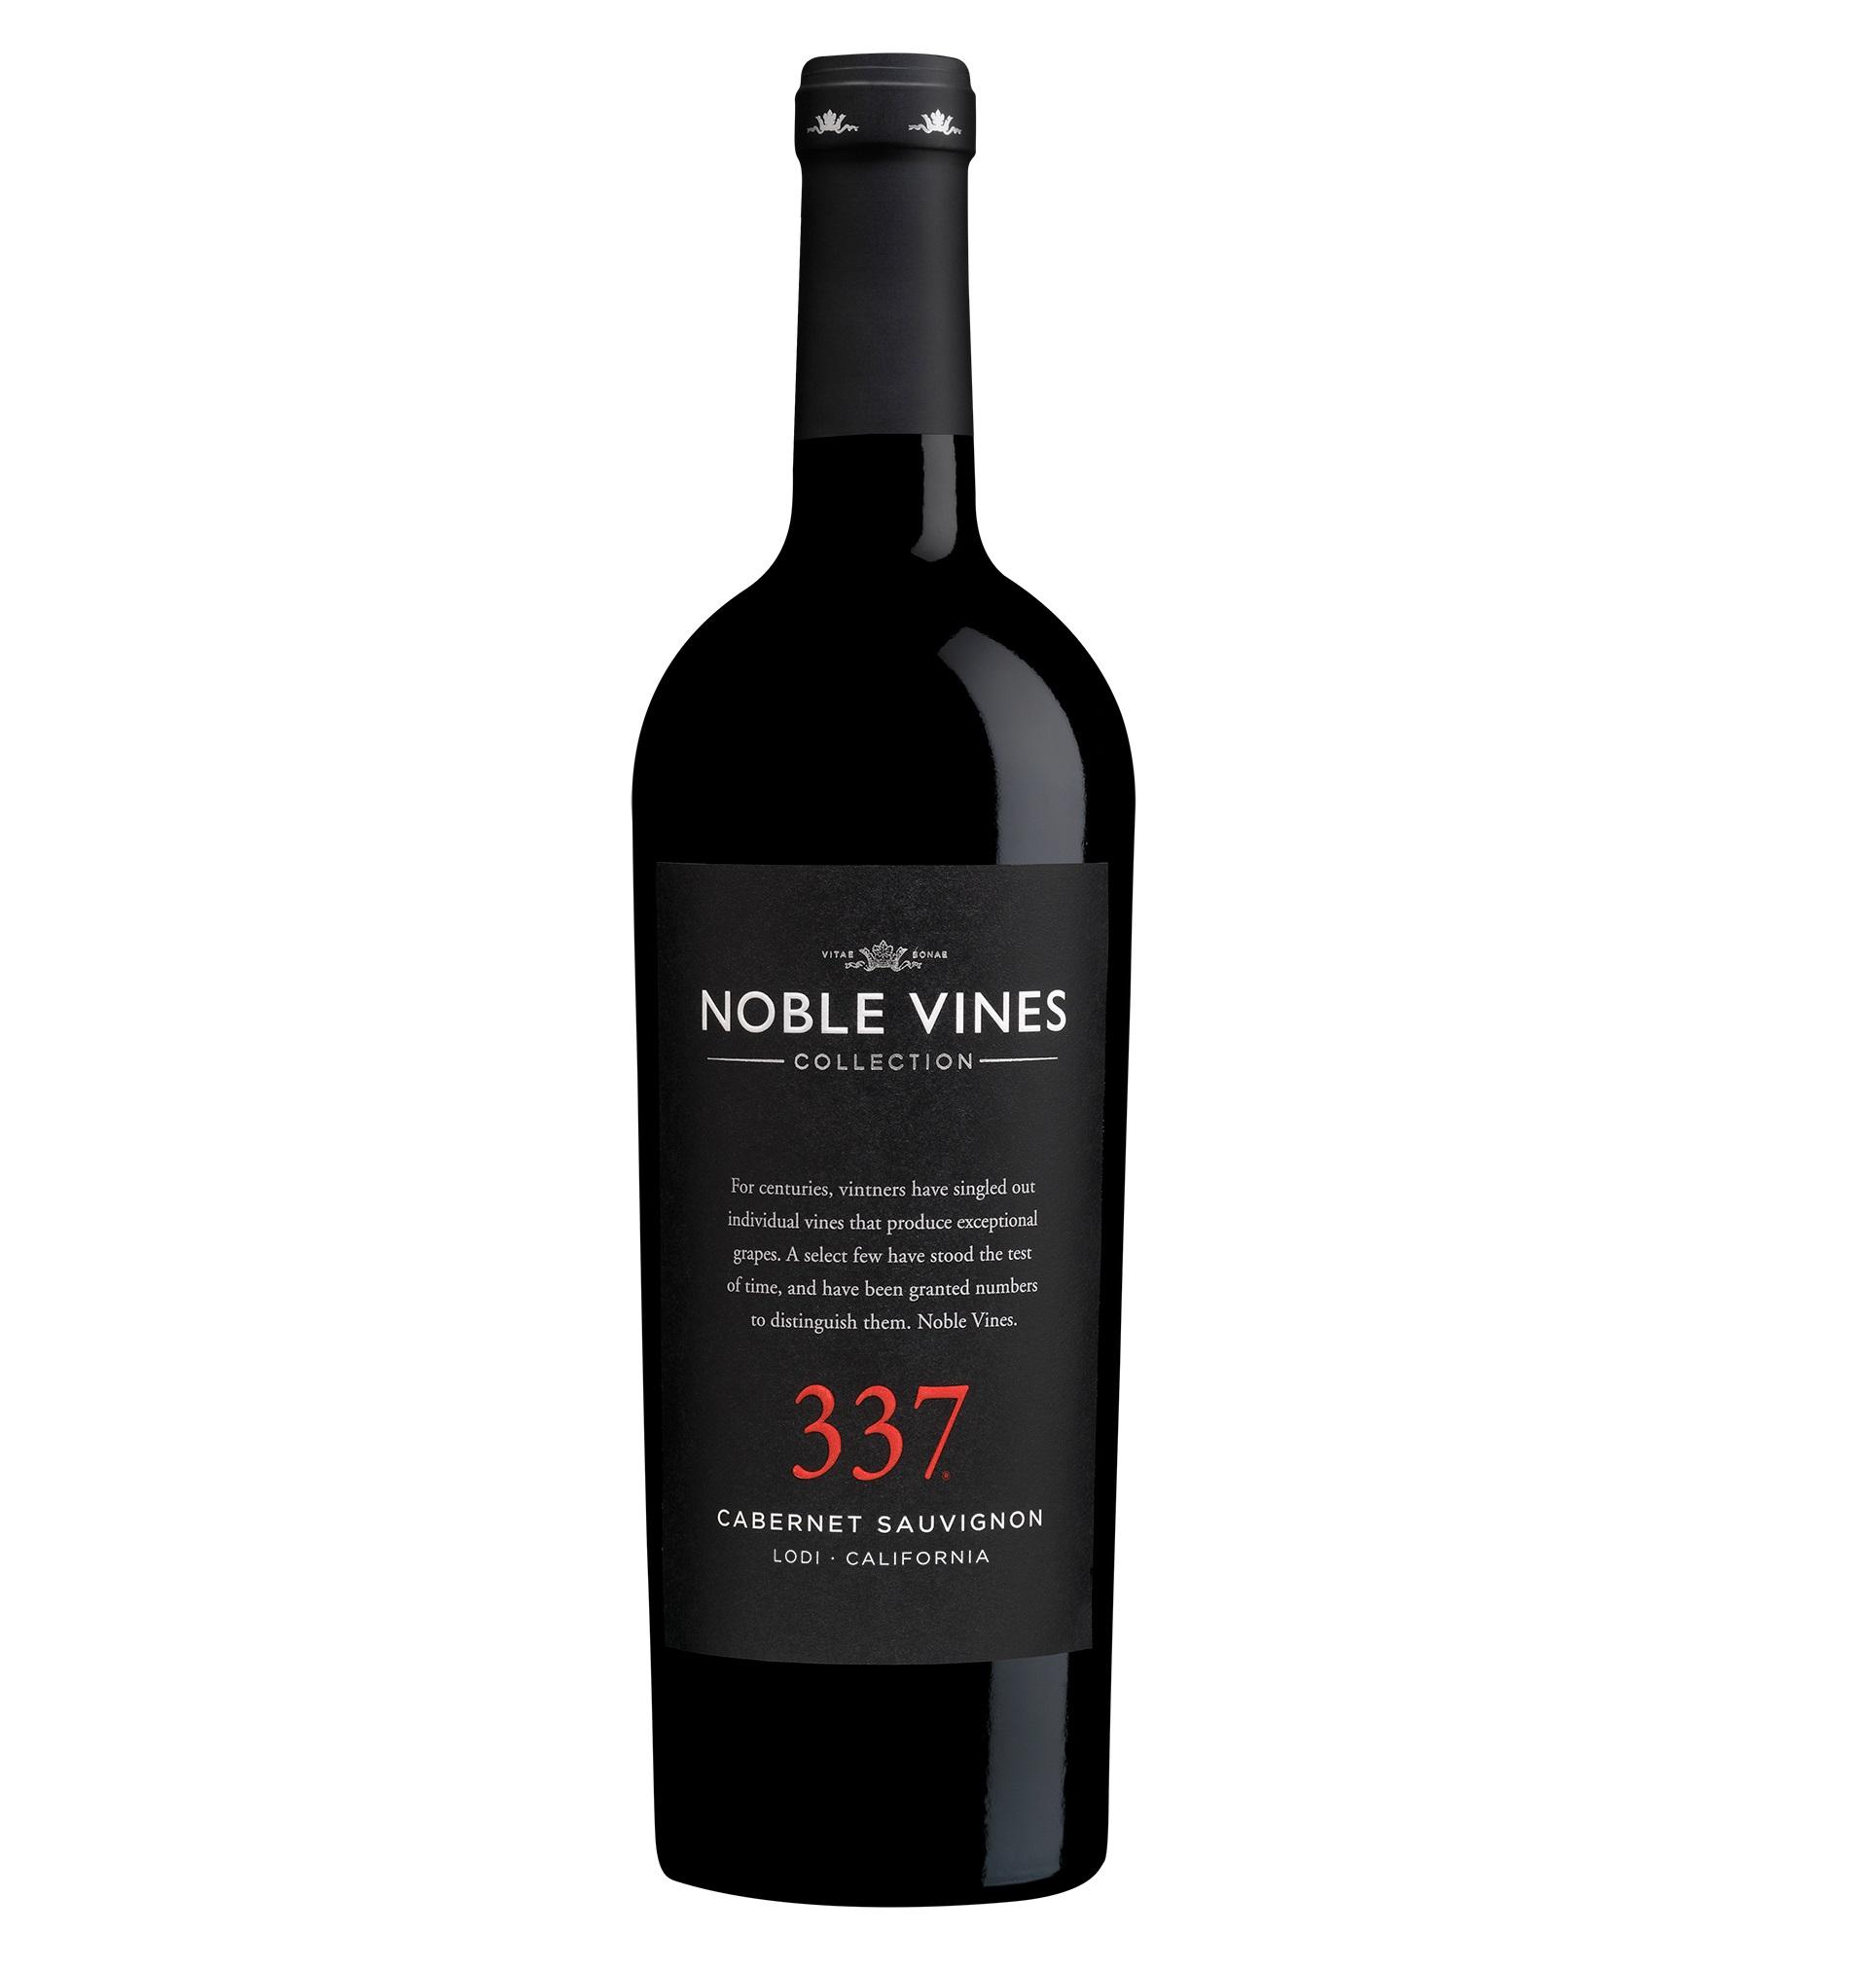 2014 Noble Vines Collection 337 Cabernet Sauvignon Lodi